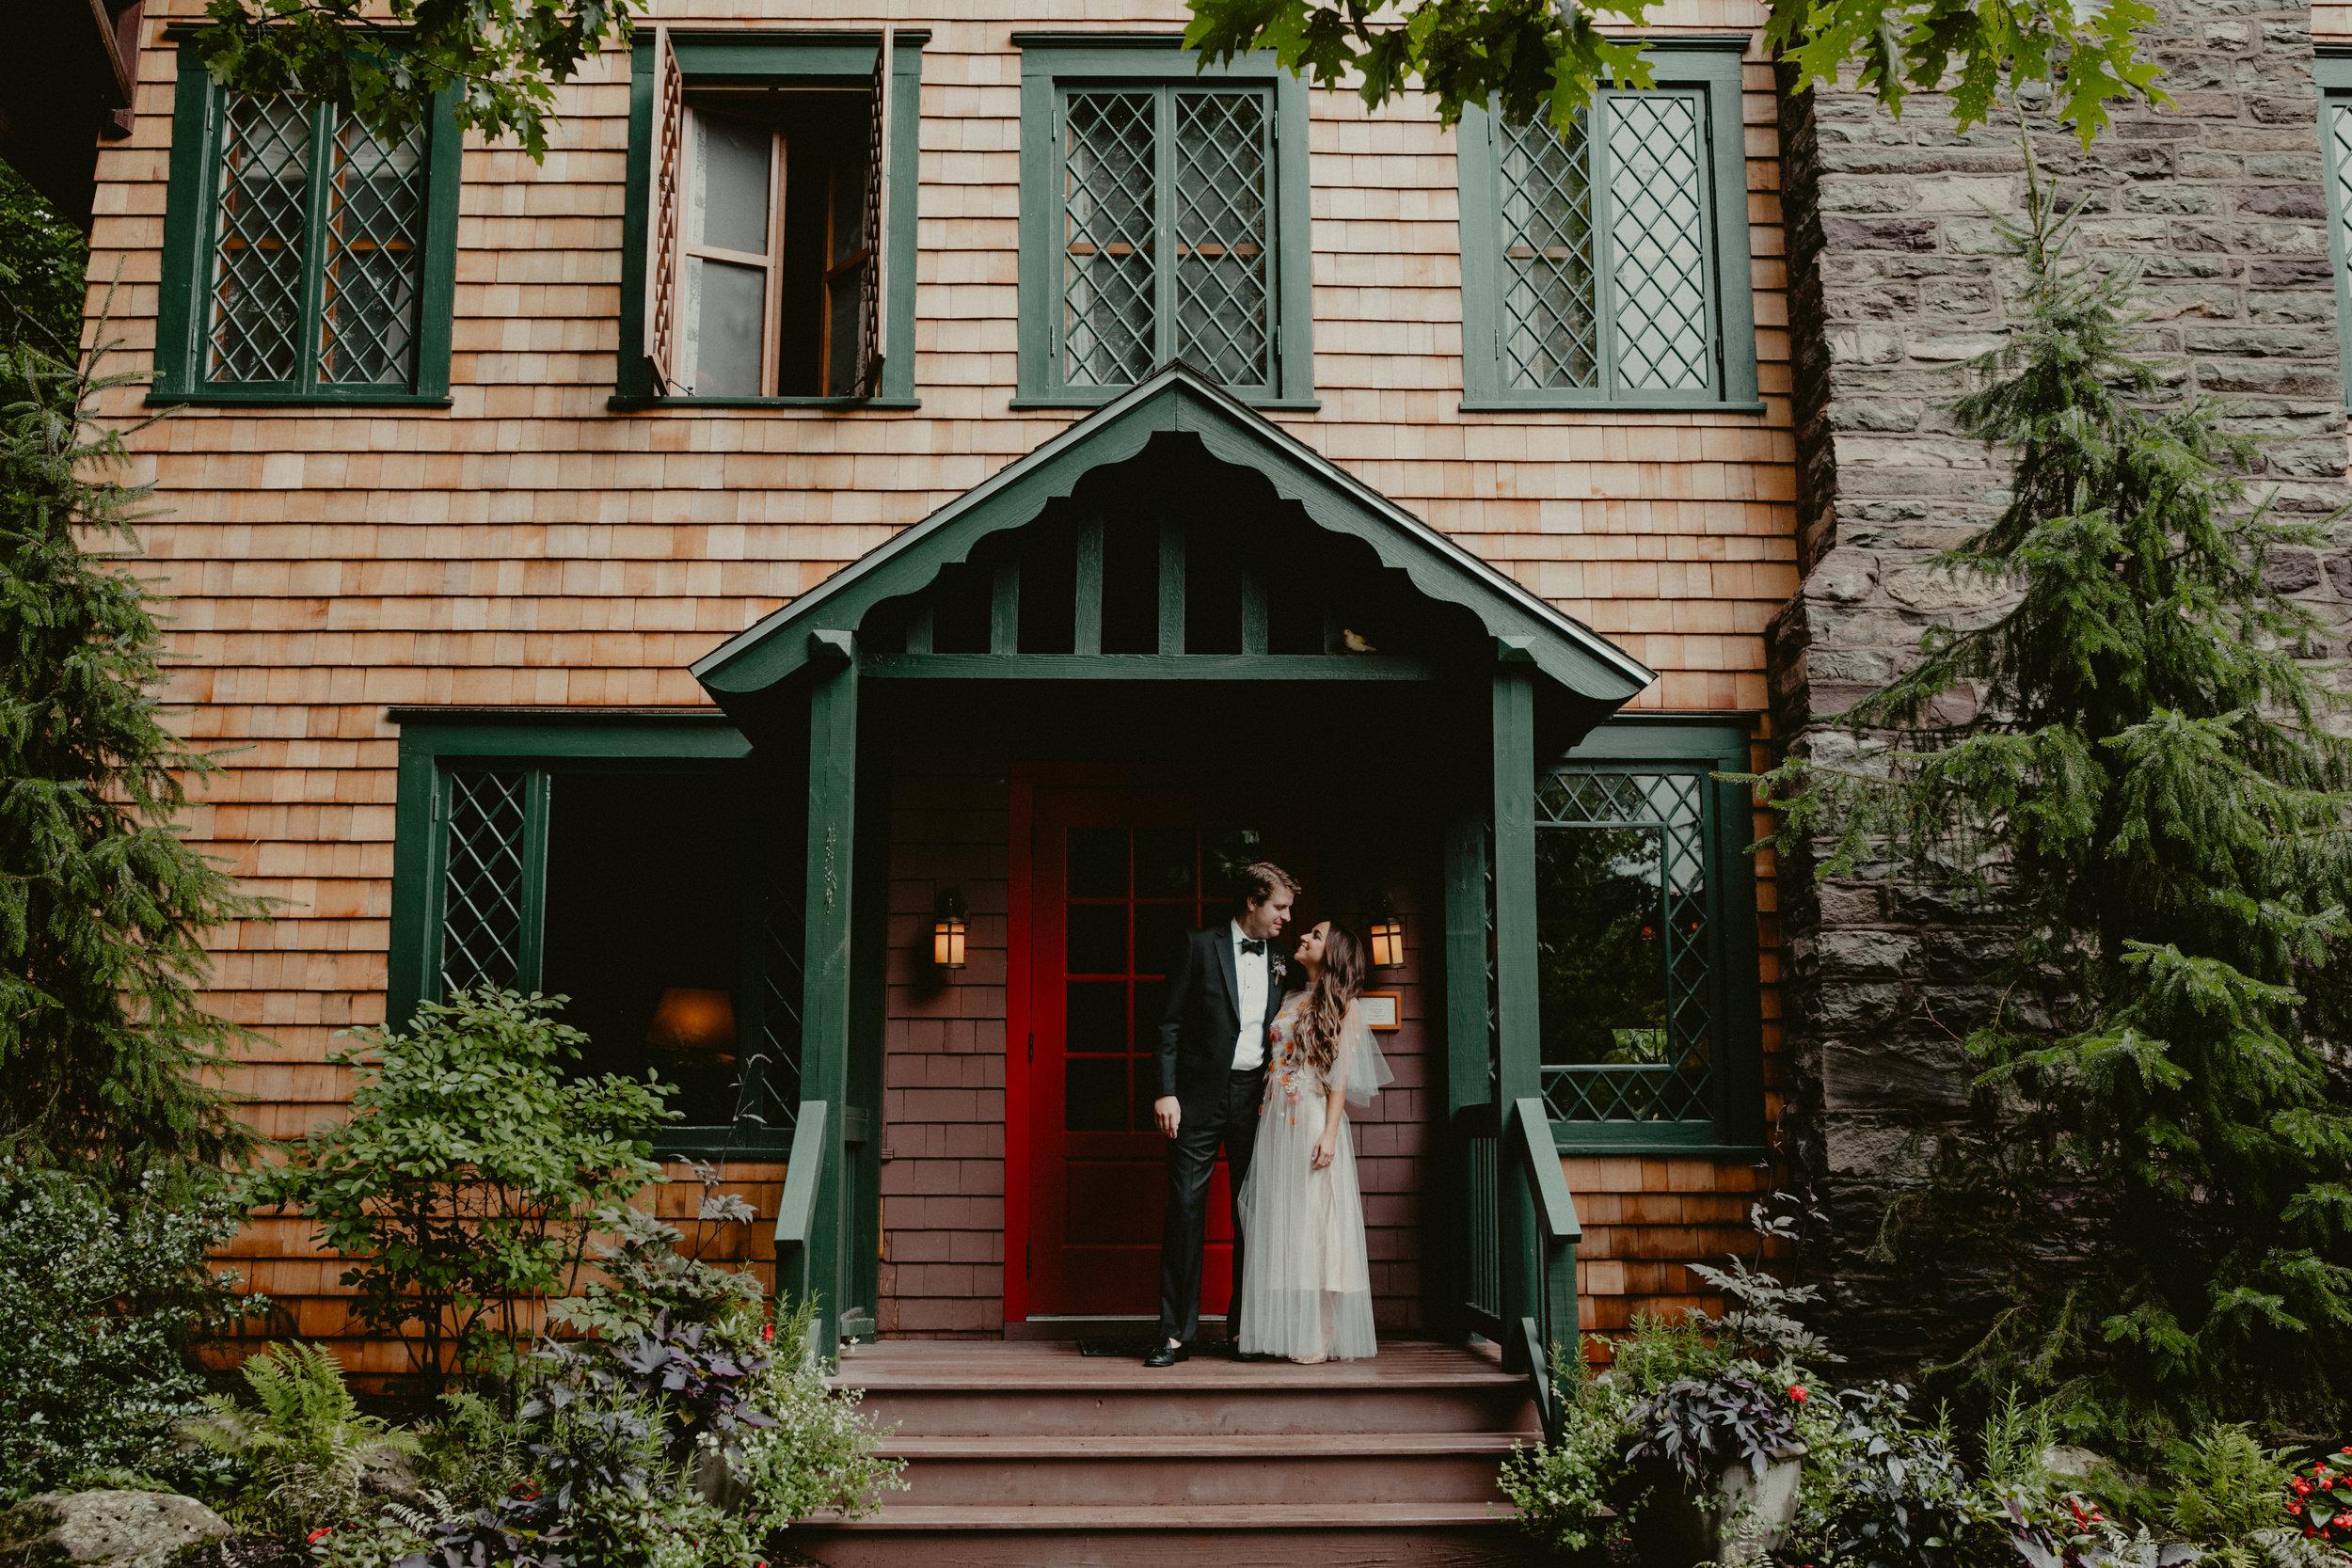 DEER_MOUNTAIN_INN_WEDDING_CHELLISE_MICHAEL_PHOTOGRAPHY-1151.jpg